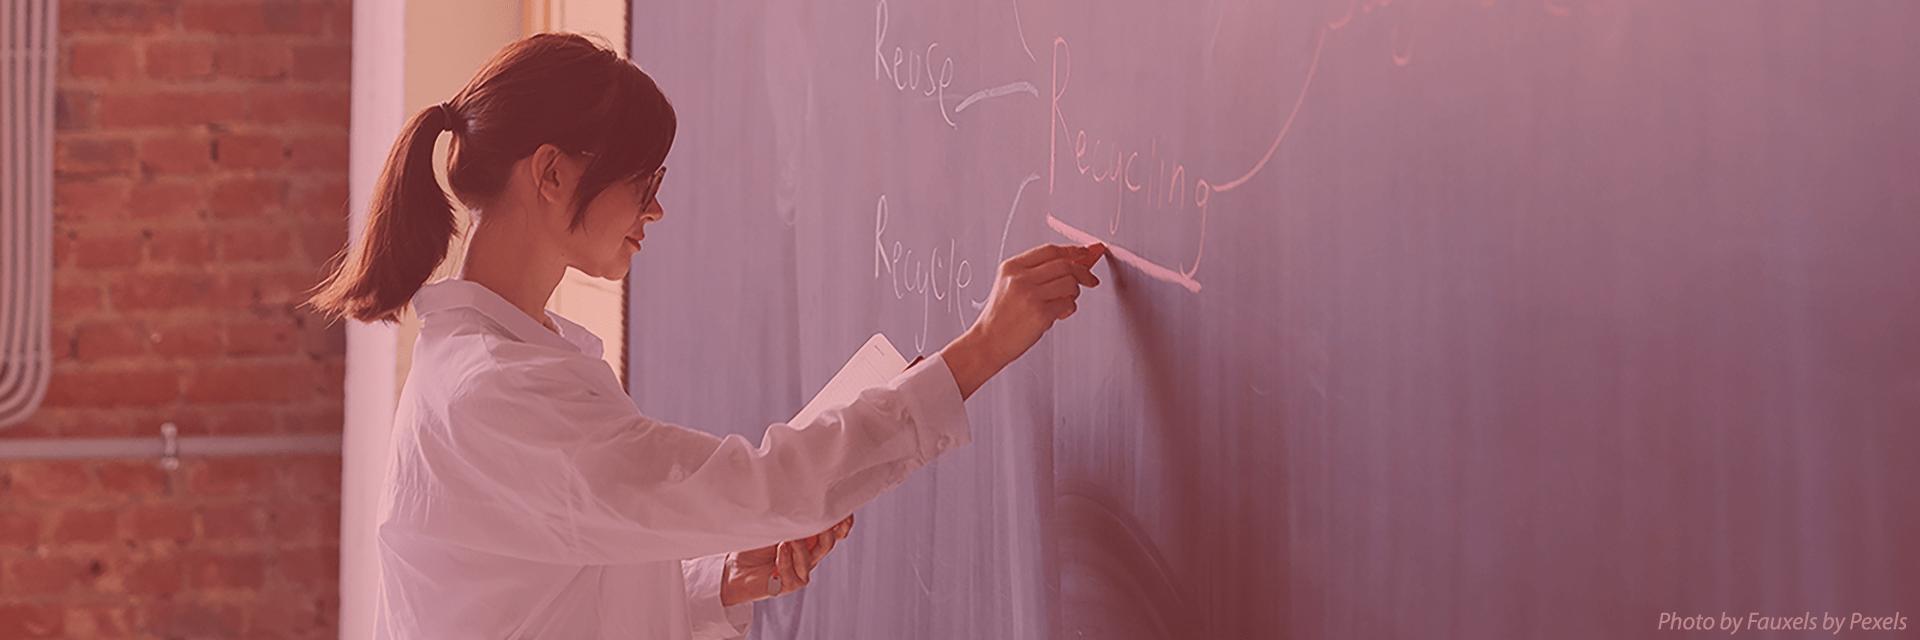 Female instructor writing on chalkboard